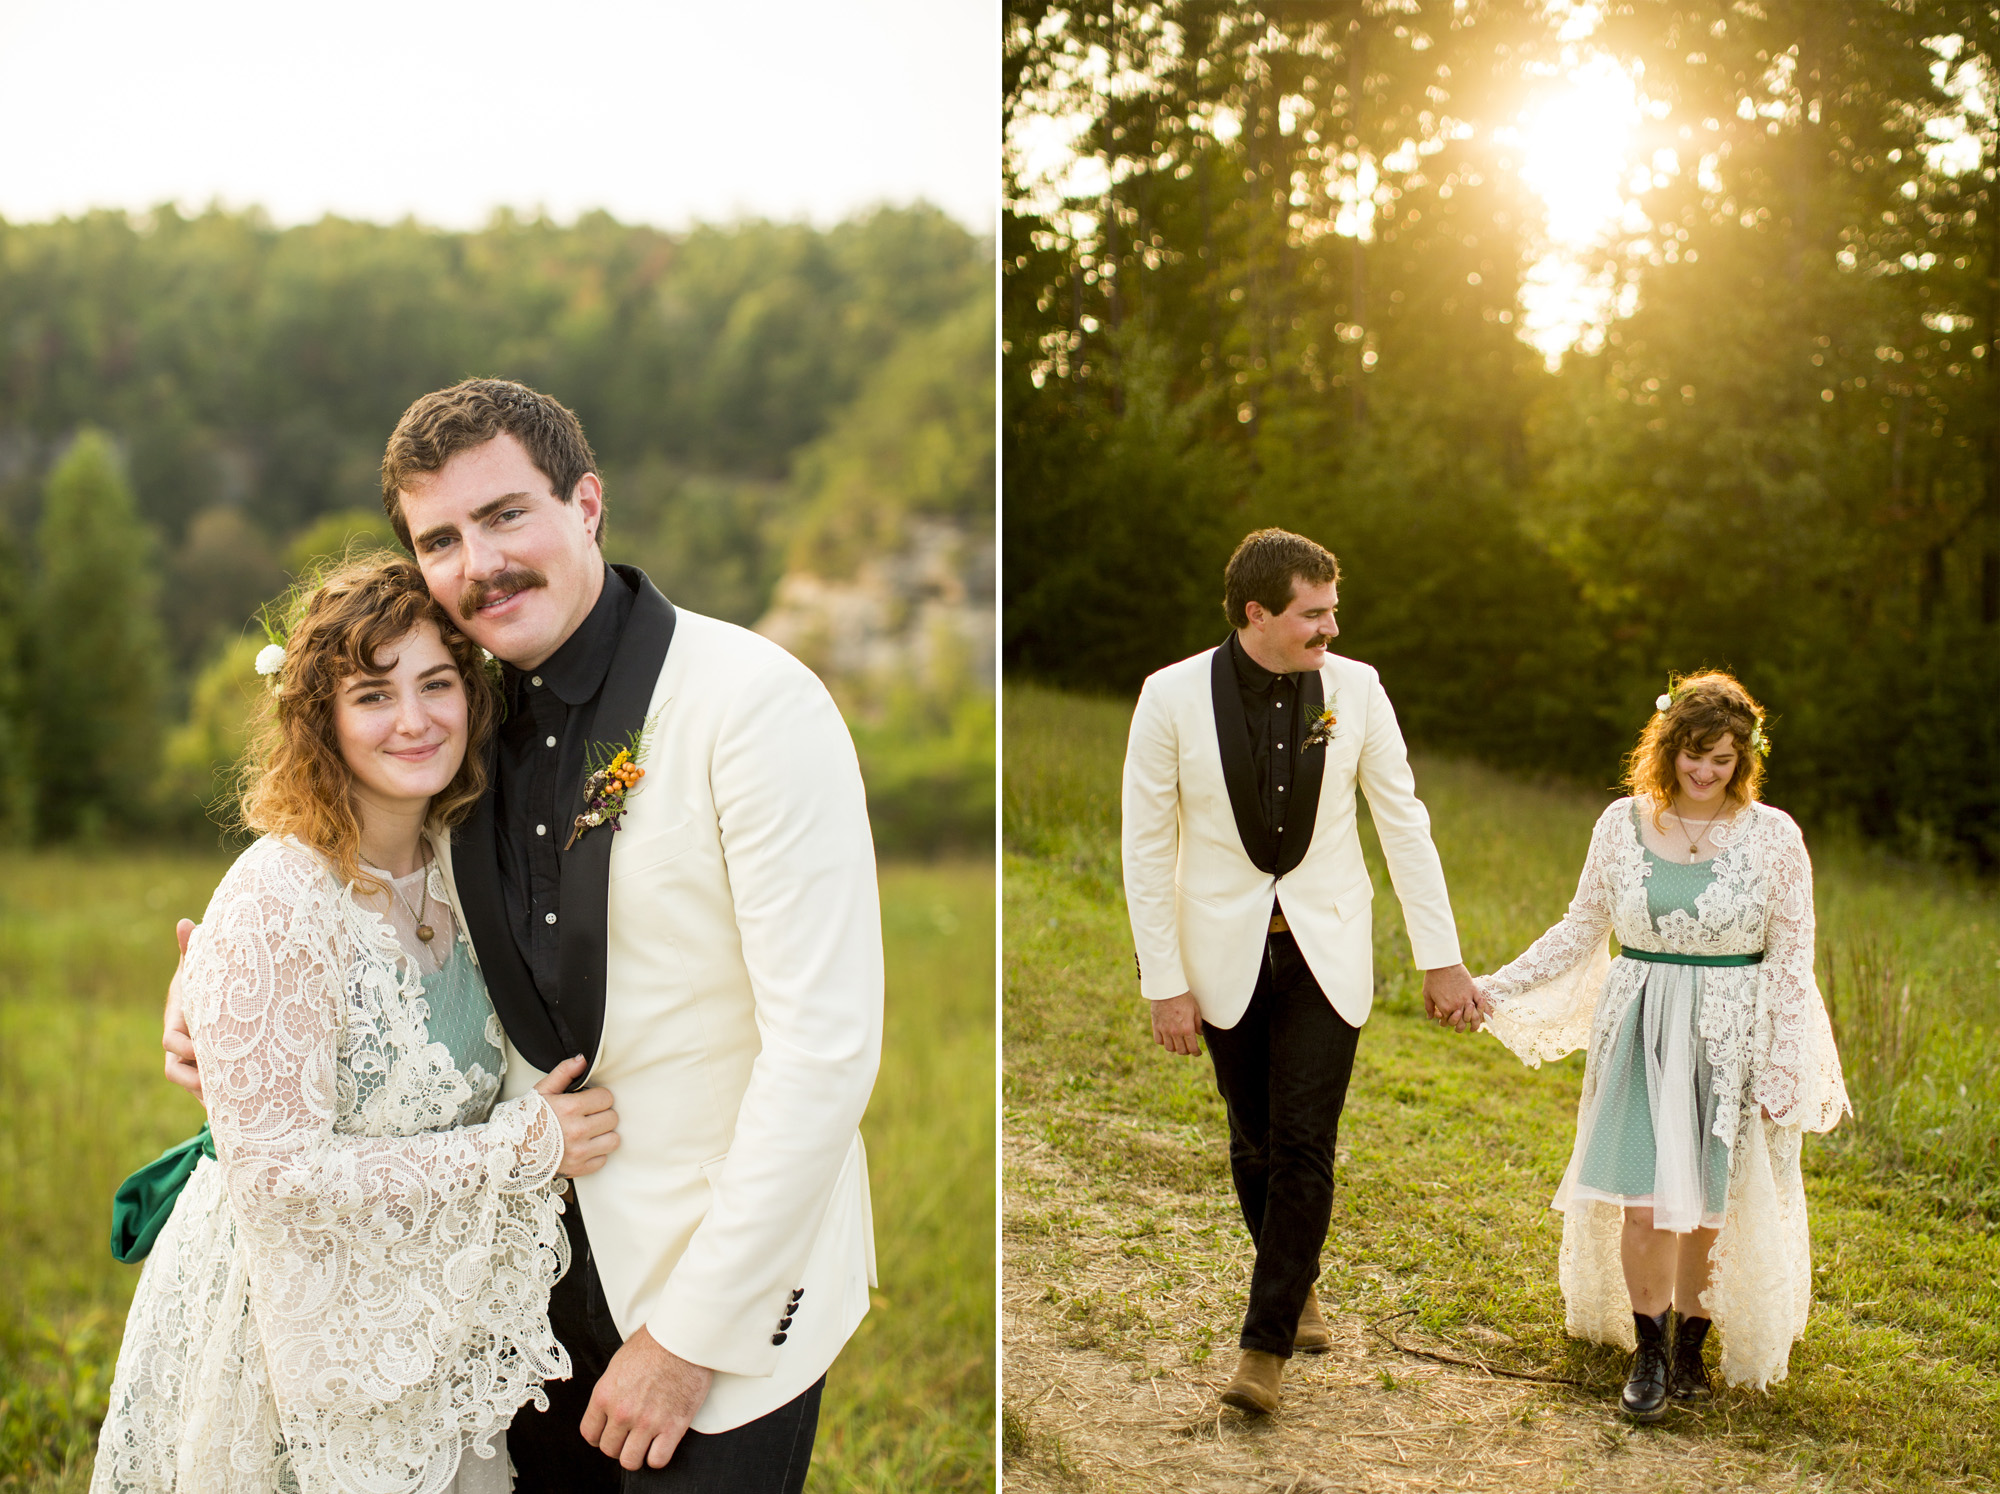 Seriously_Sabrina_Photography_Red_River_Gorge_Kentucky_Wedding_ShawnDana152.jpg